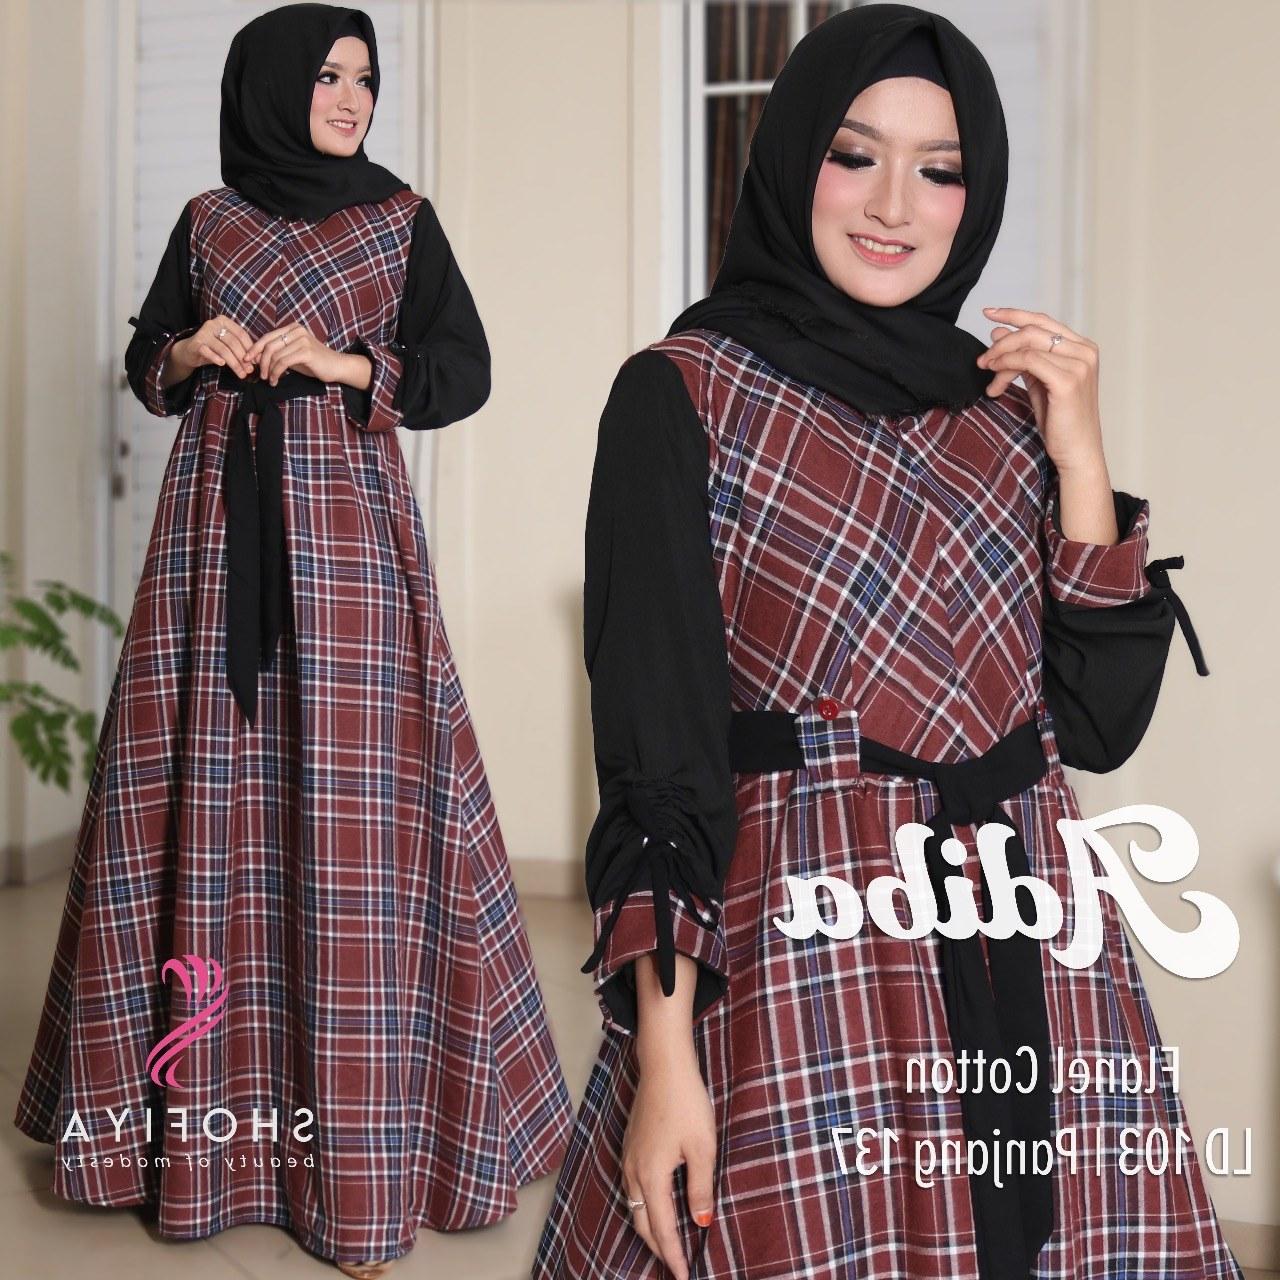 Design Model Baju Lebaran Wanita 2019 3id6 Ide 21 Model Baju Lebaran 2019 Untuk Remaja